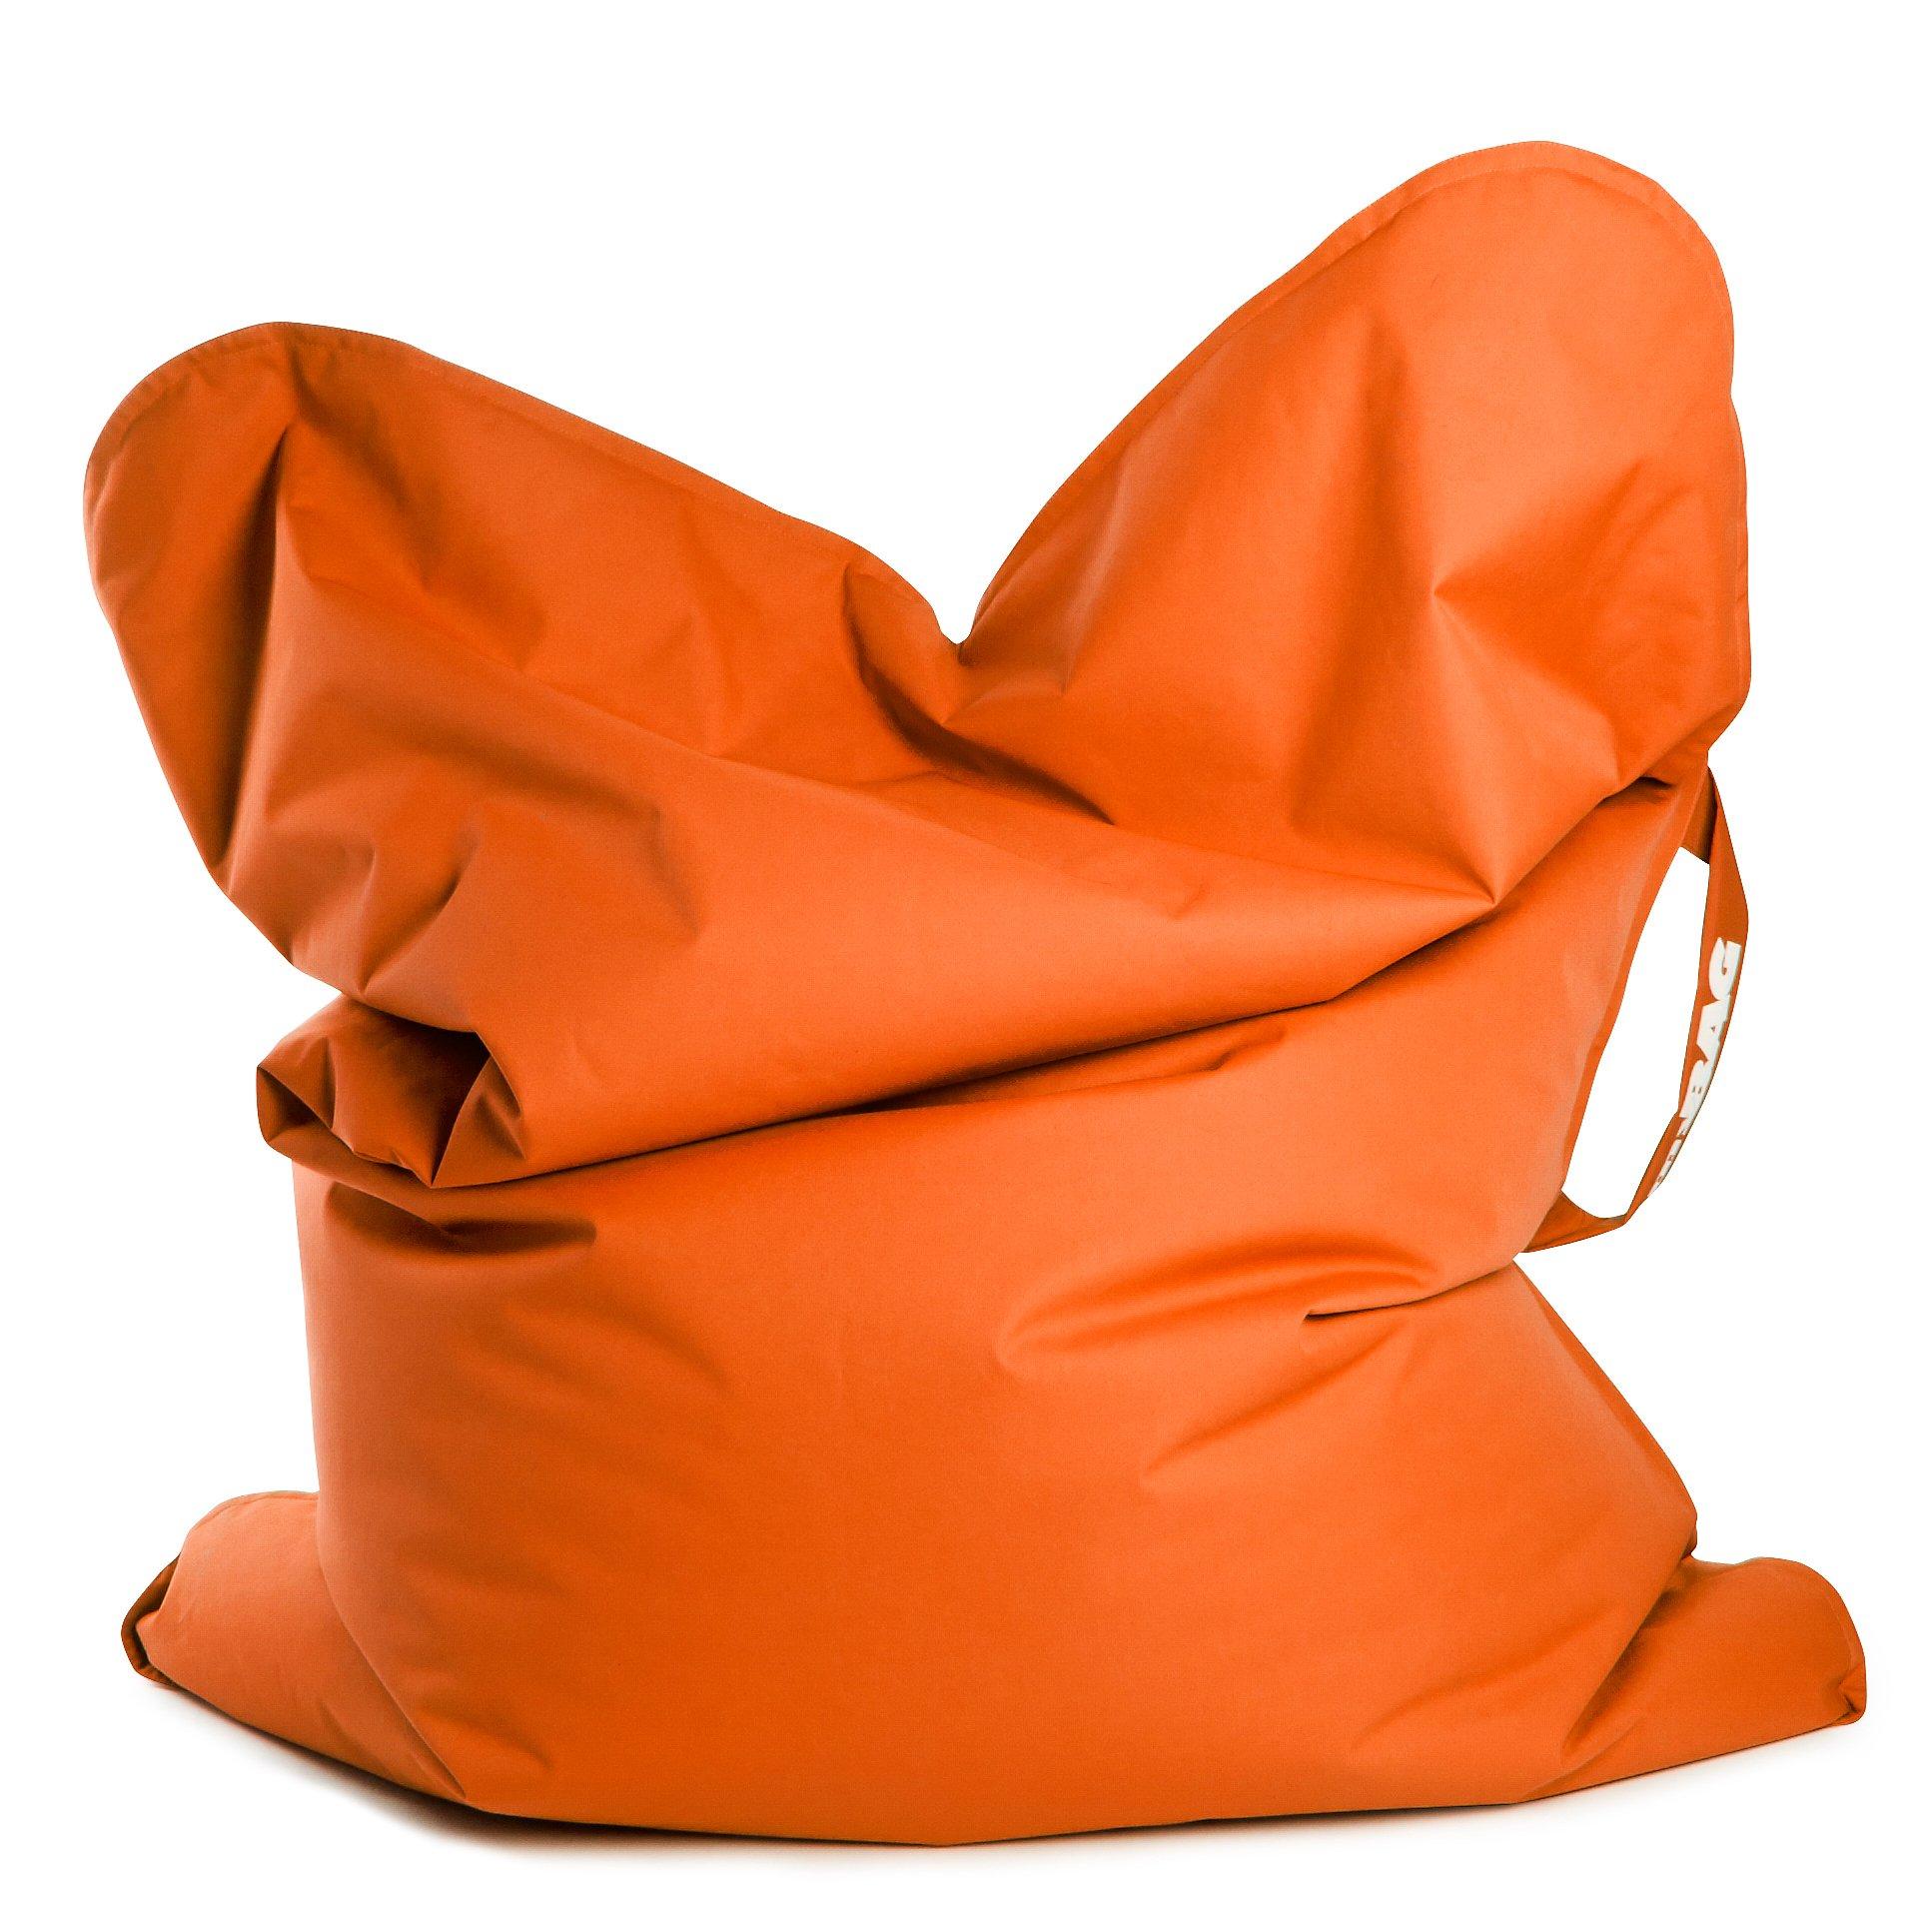 Sitzsack Mybag Scuba Farbe Orange Bestellen Weltbildde